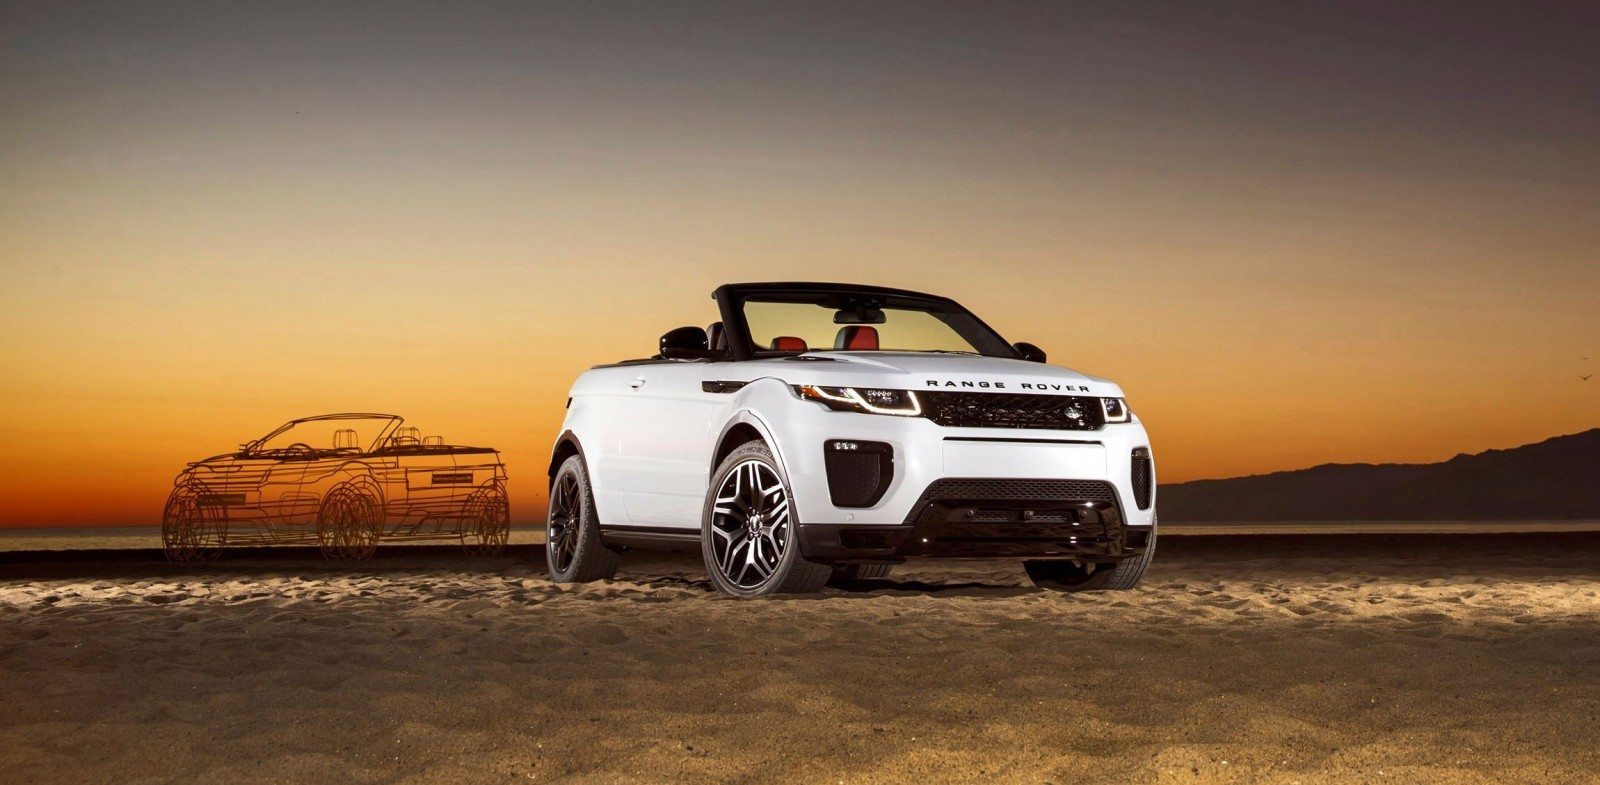 2016 range rover evoque convertible la 20. Black Bedroom Furniture Sets. Home Design Ideas